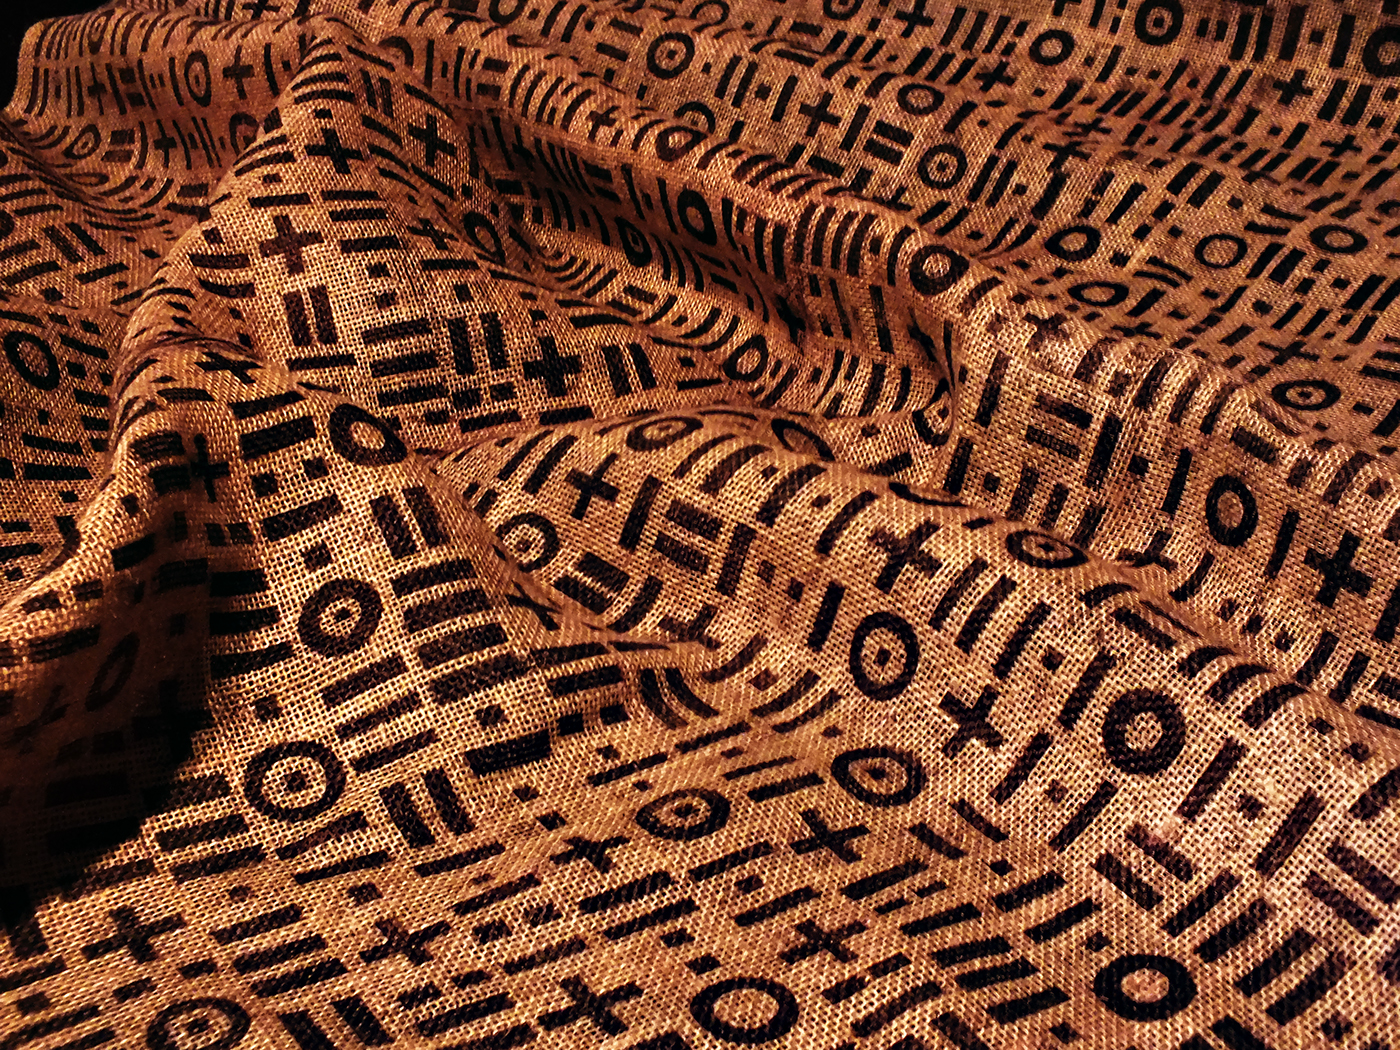 linocut,object,fabric,Artistic Fabric